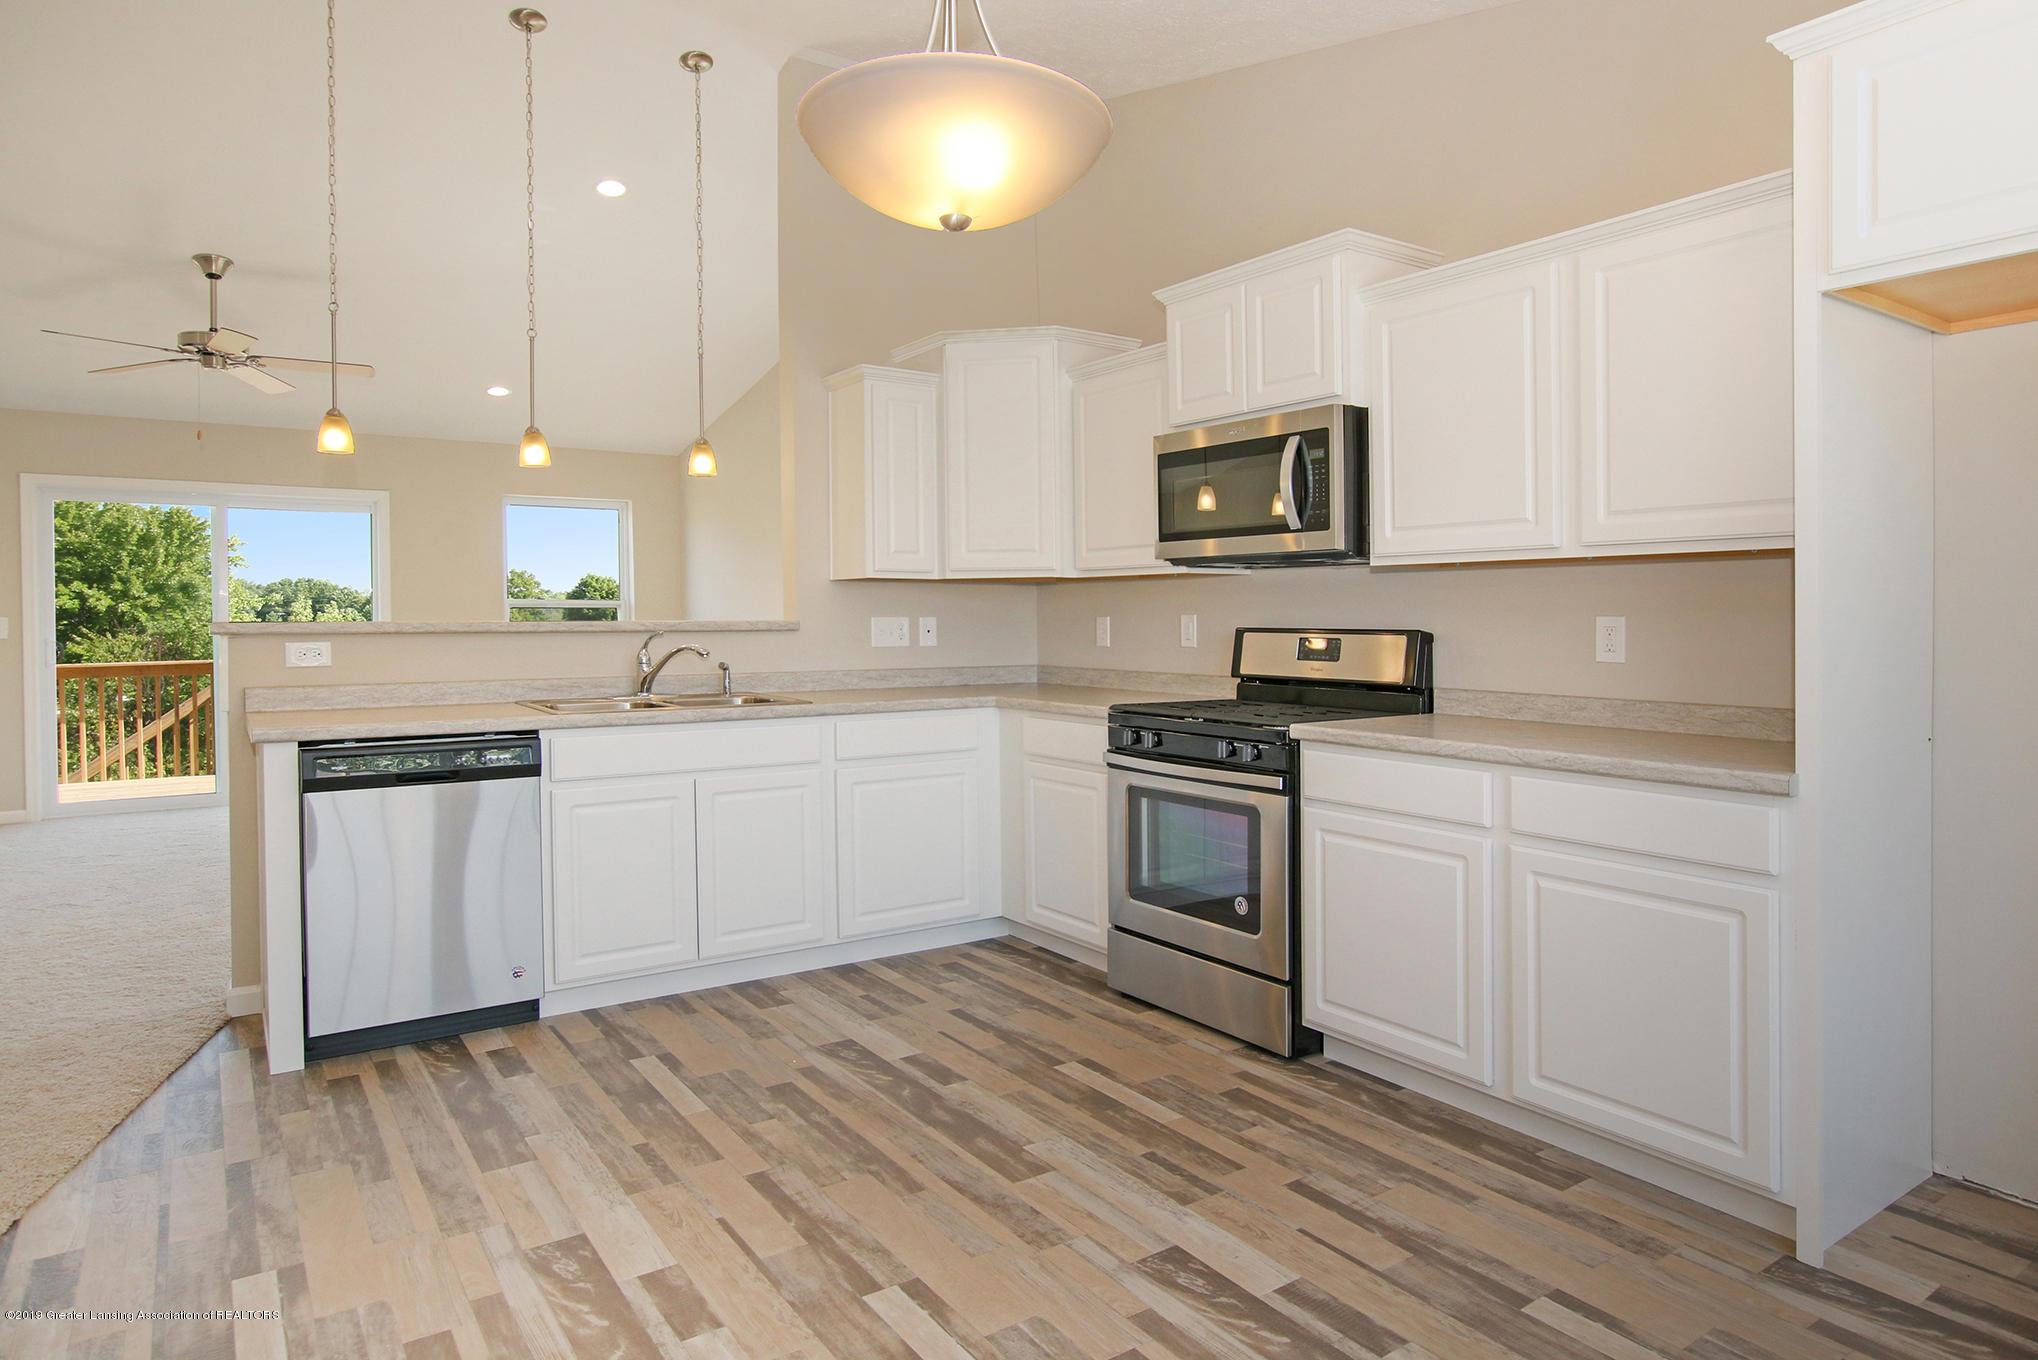 3524 Fernwood Ln - GDN067-C2040 Kitchen 2 - 6